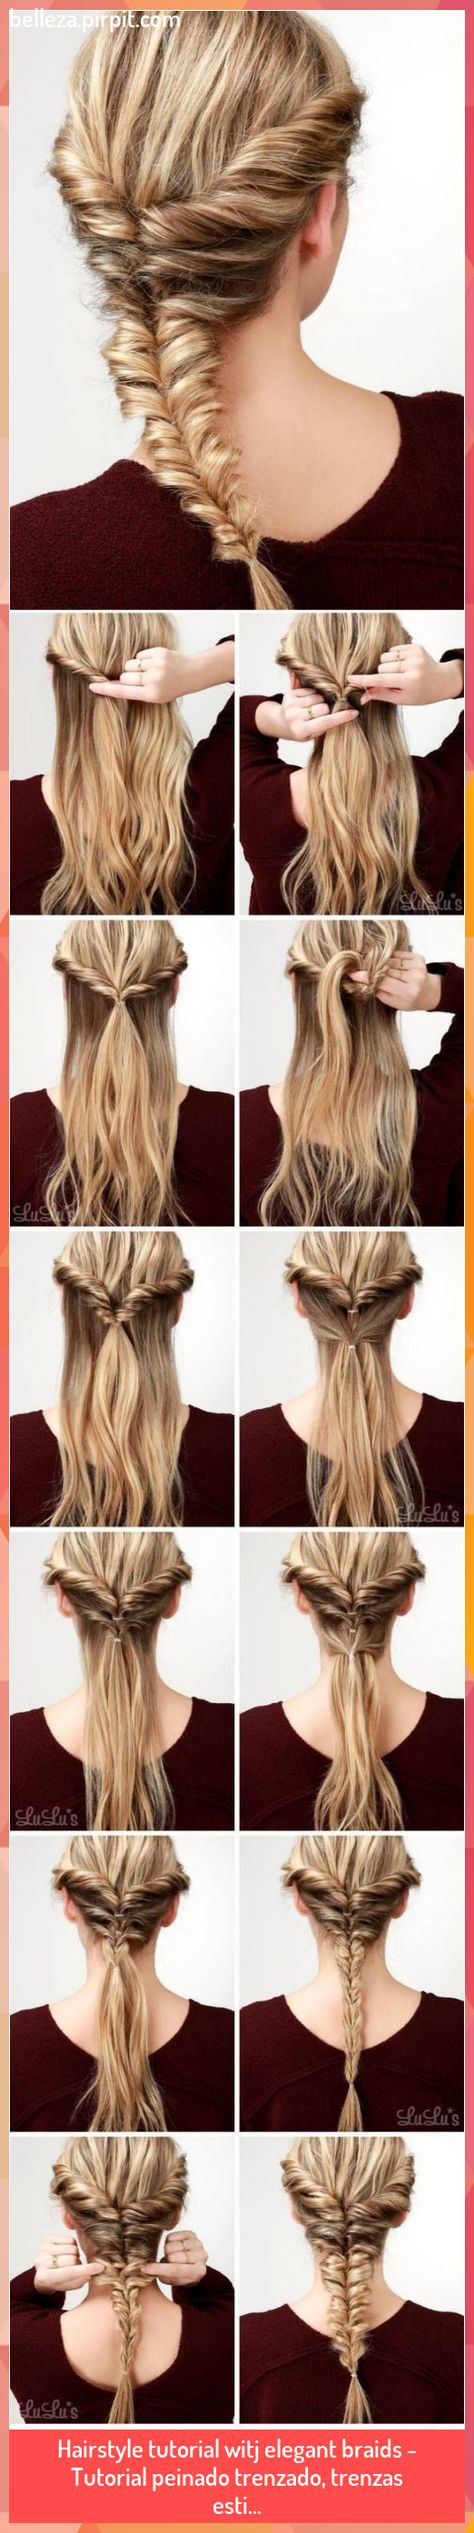 Hairstyle tutorial witj elegant braids - Tutorial peinado trenzado, trenzas esti... #Braids #Elegant #esti #Hairstyle #Peinado #trenzado #trenzas #TUTORIAL #witj